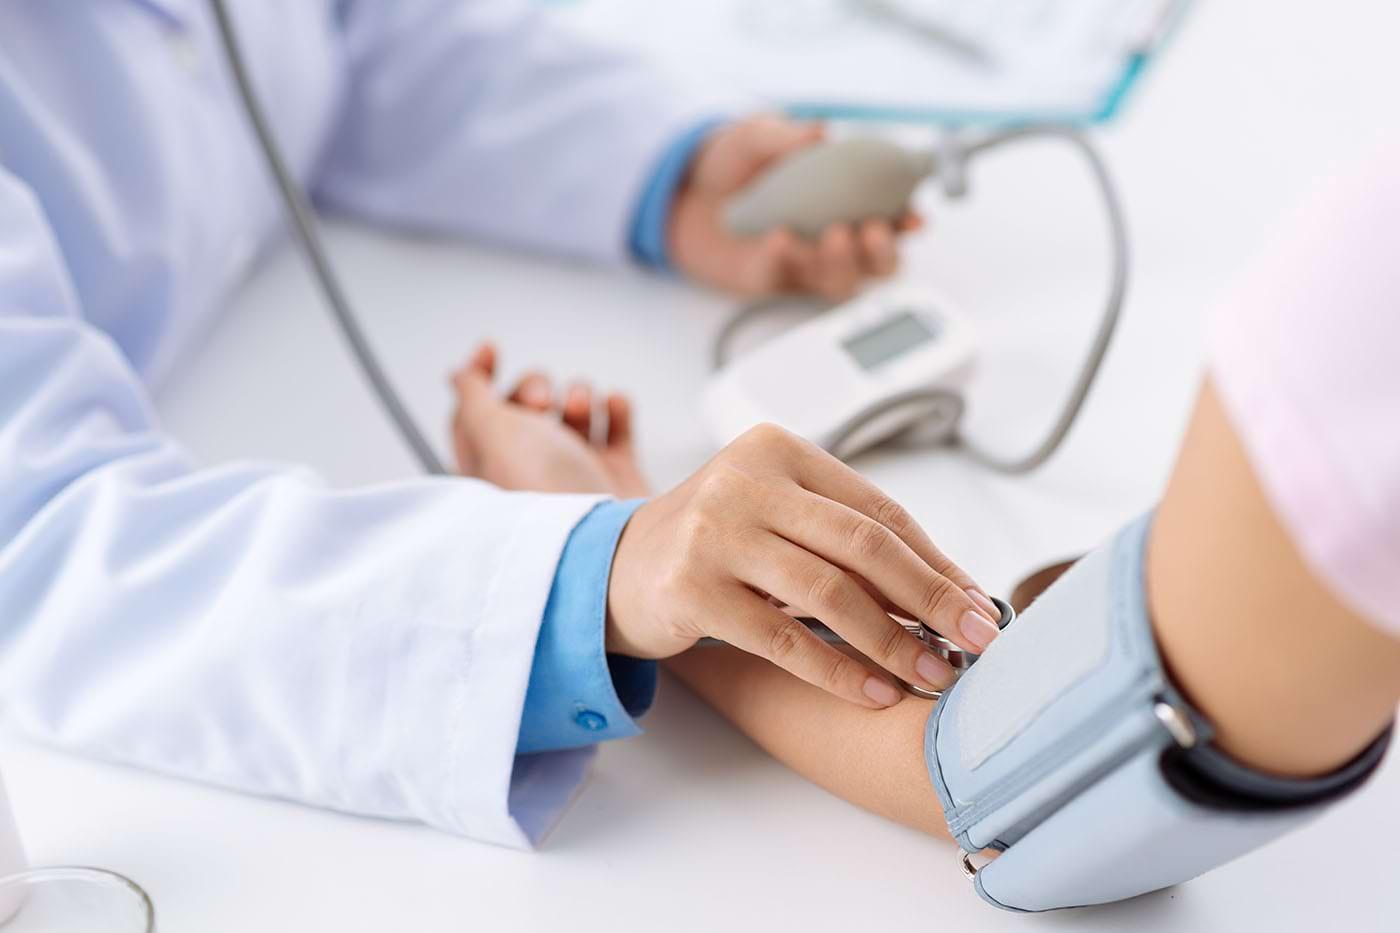 Ai putea avea hipertensiune? 4 semne de avertizare